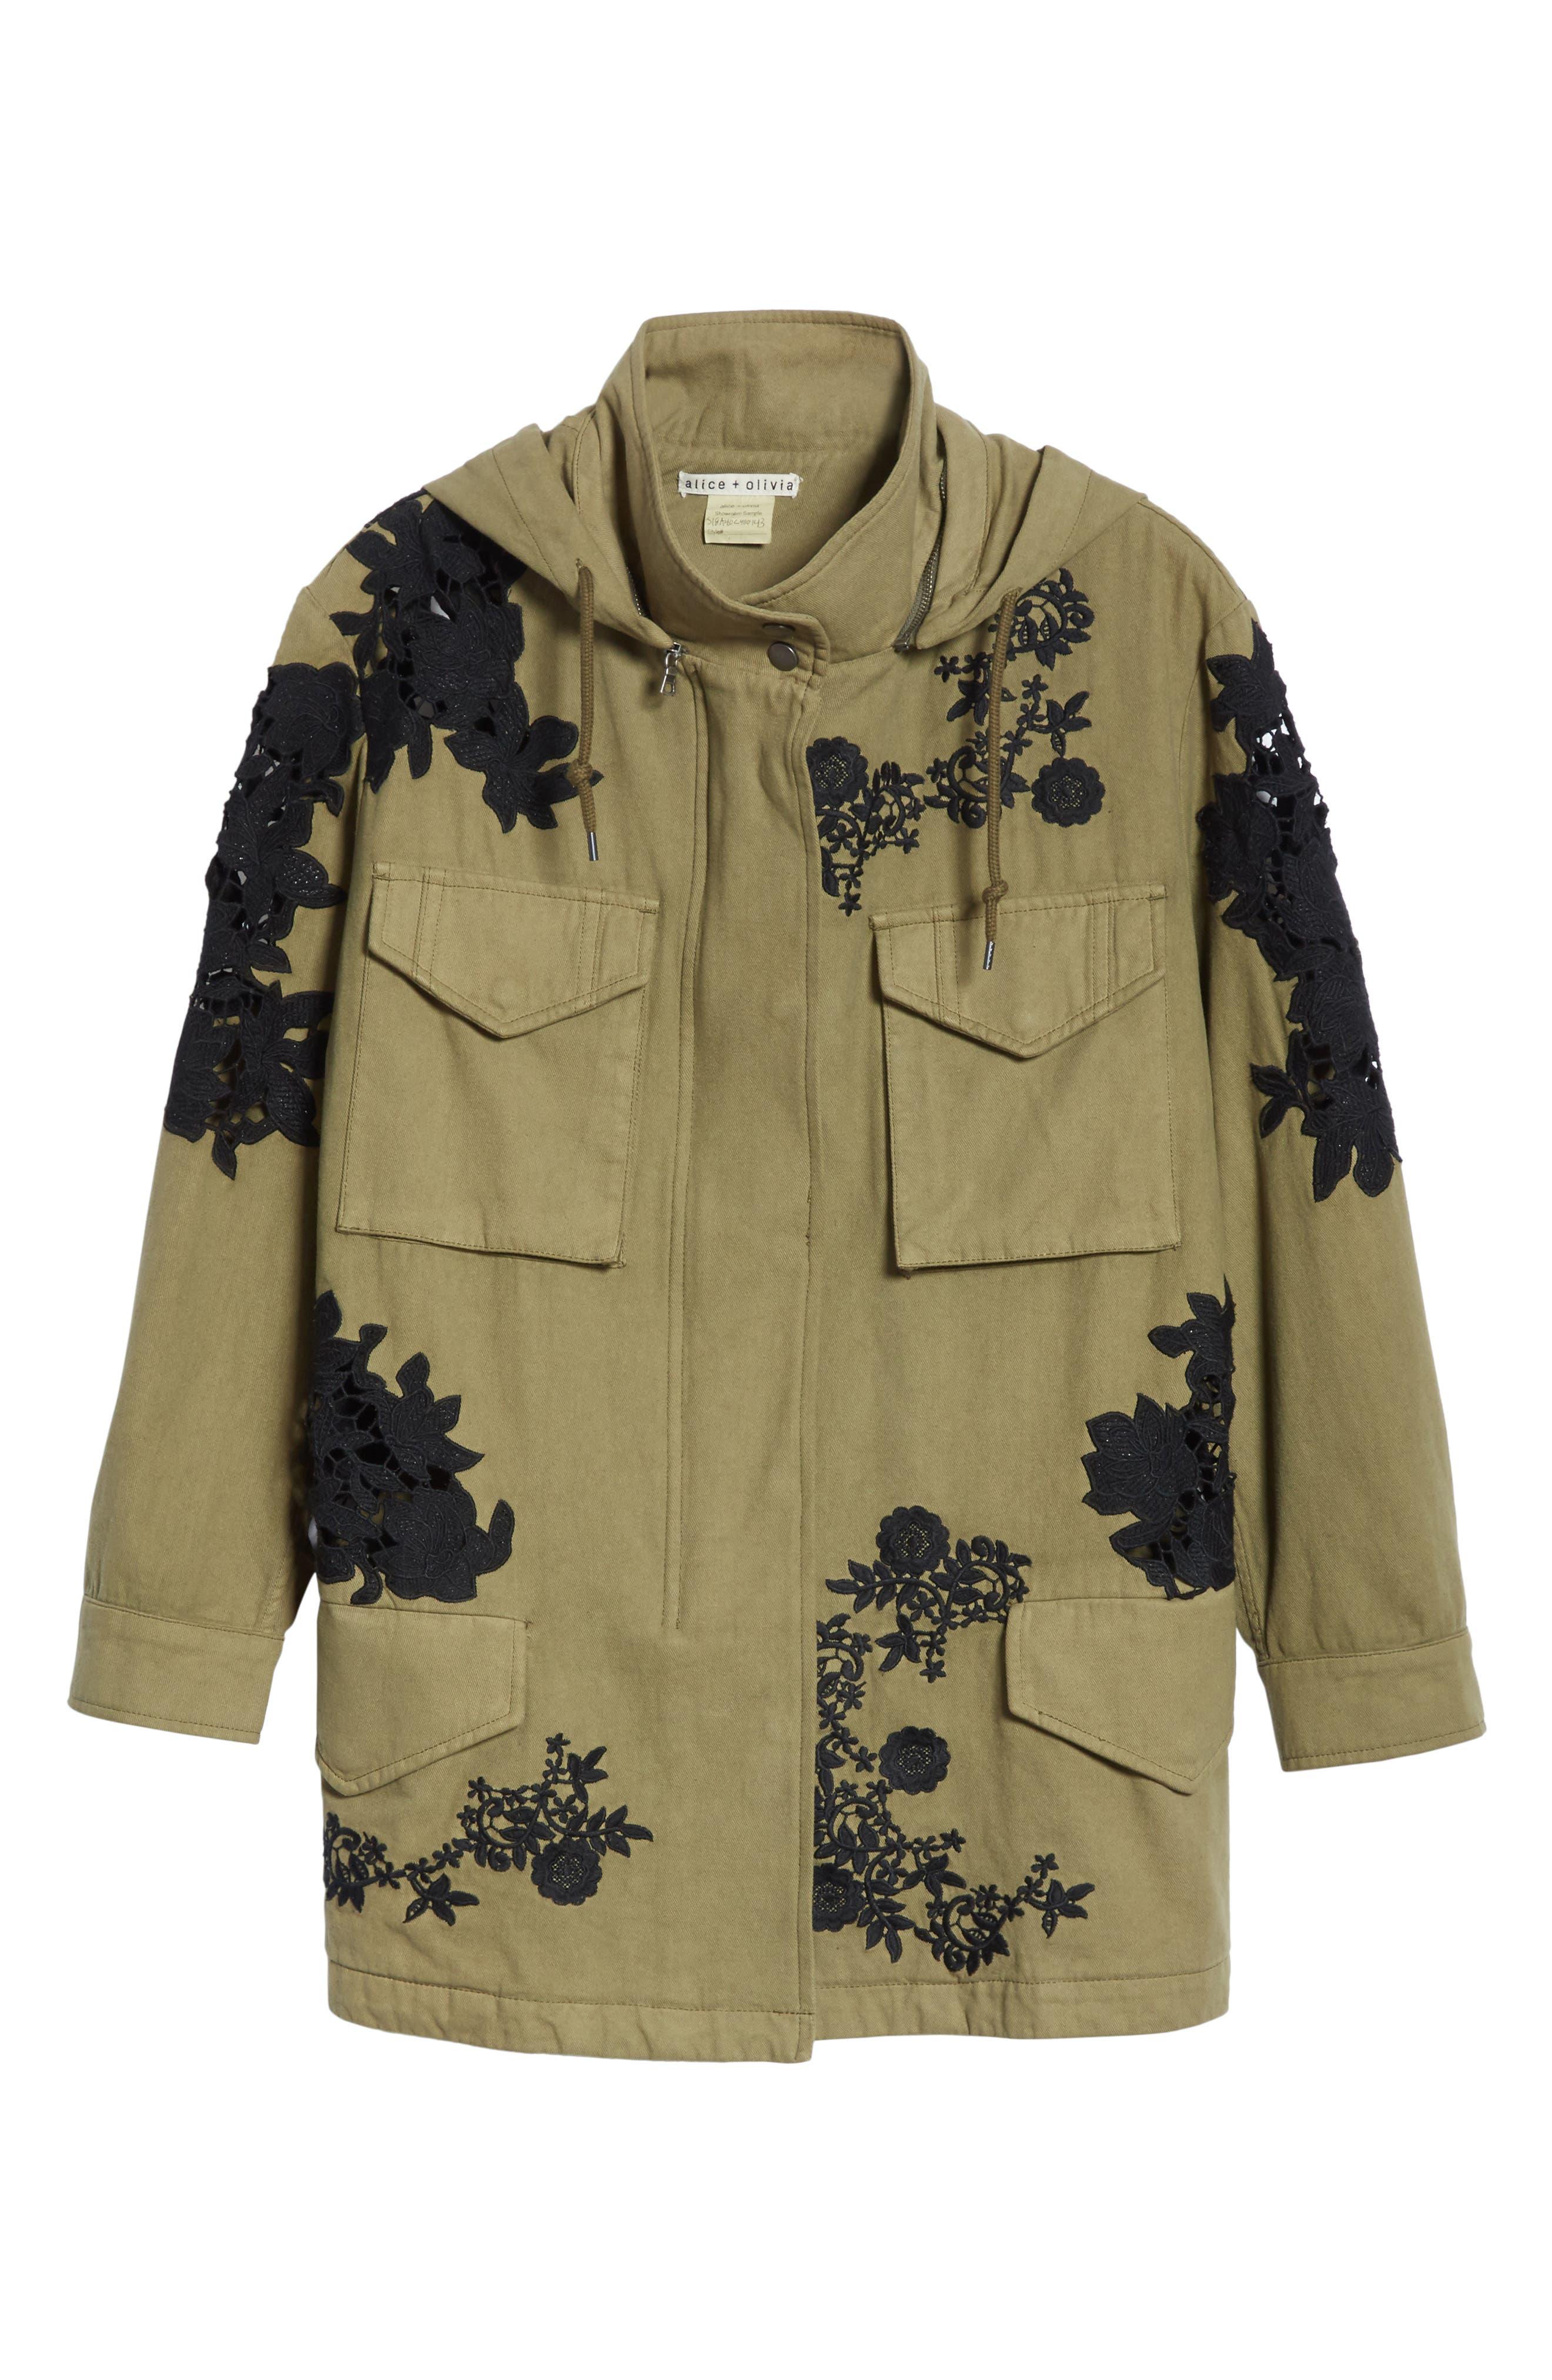 Meta Embroidered Utility Jacket,                             Alternate thumbnail 6, color,                             Olive/ Black